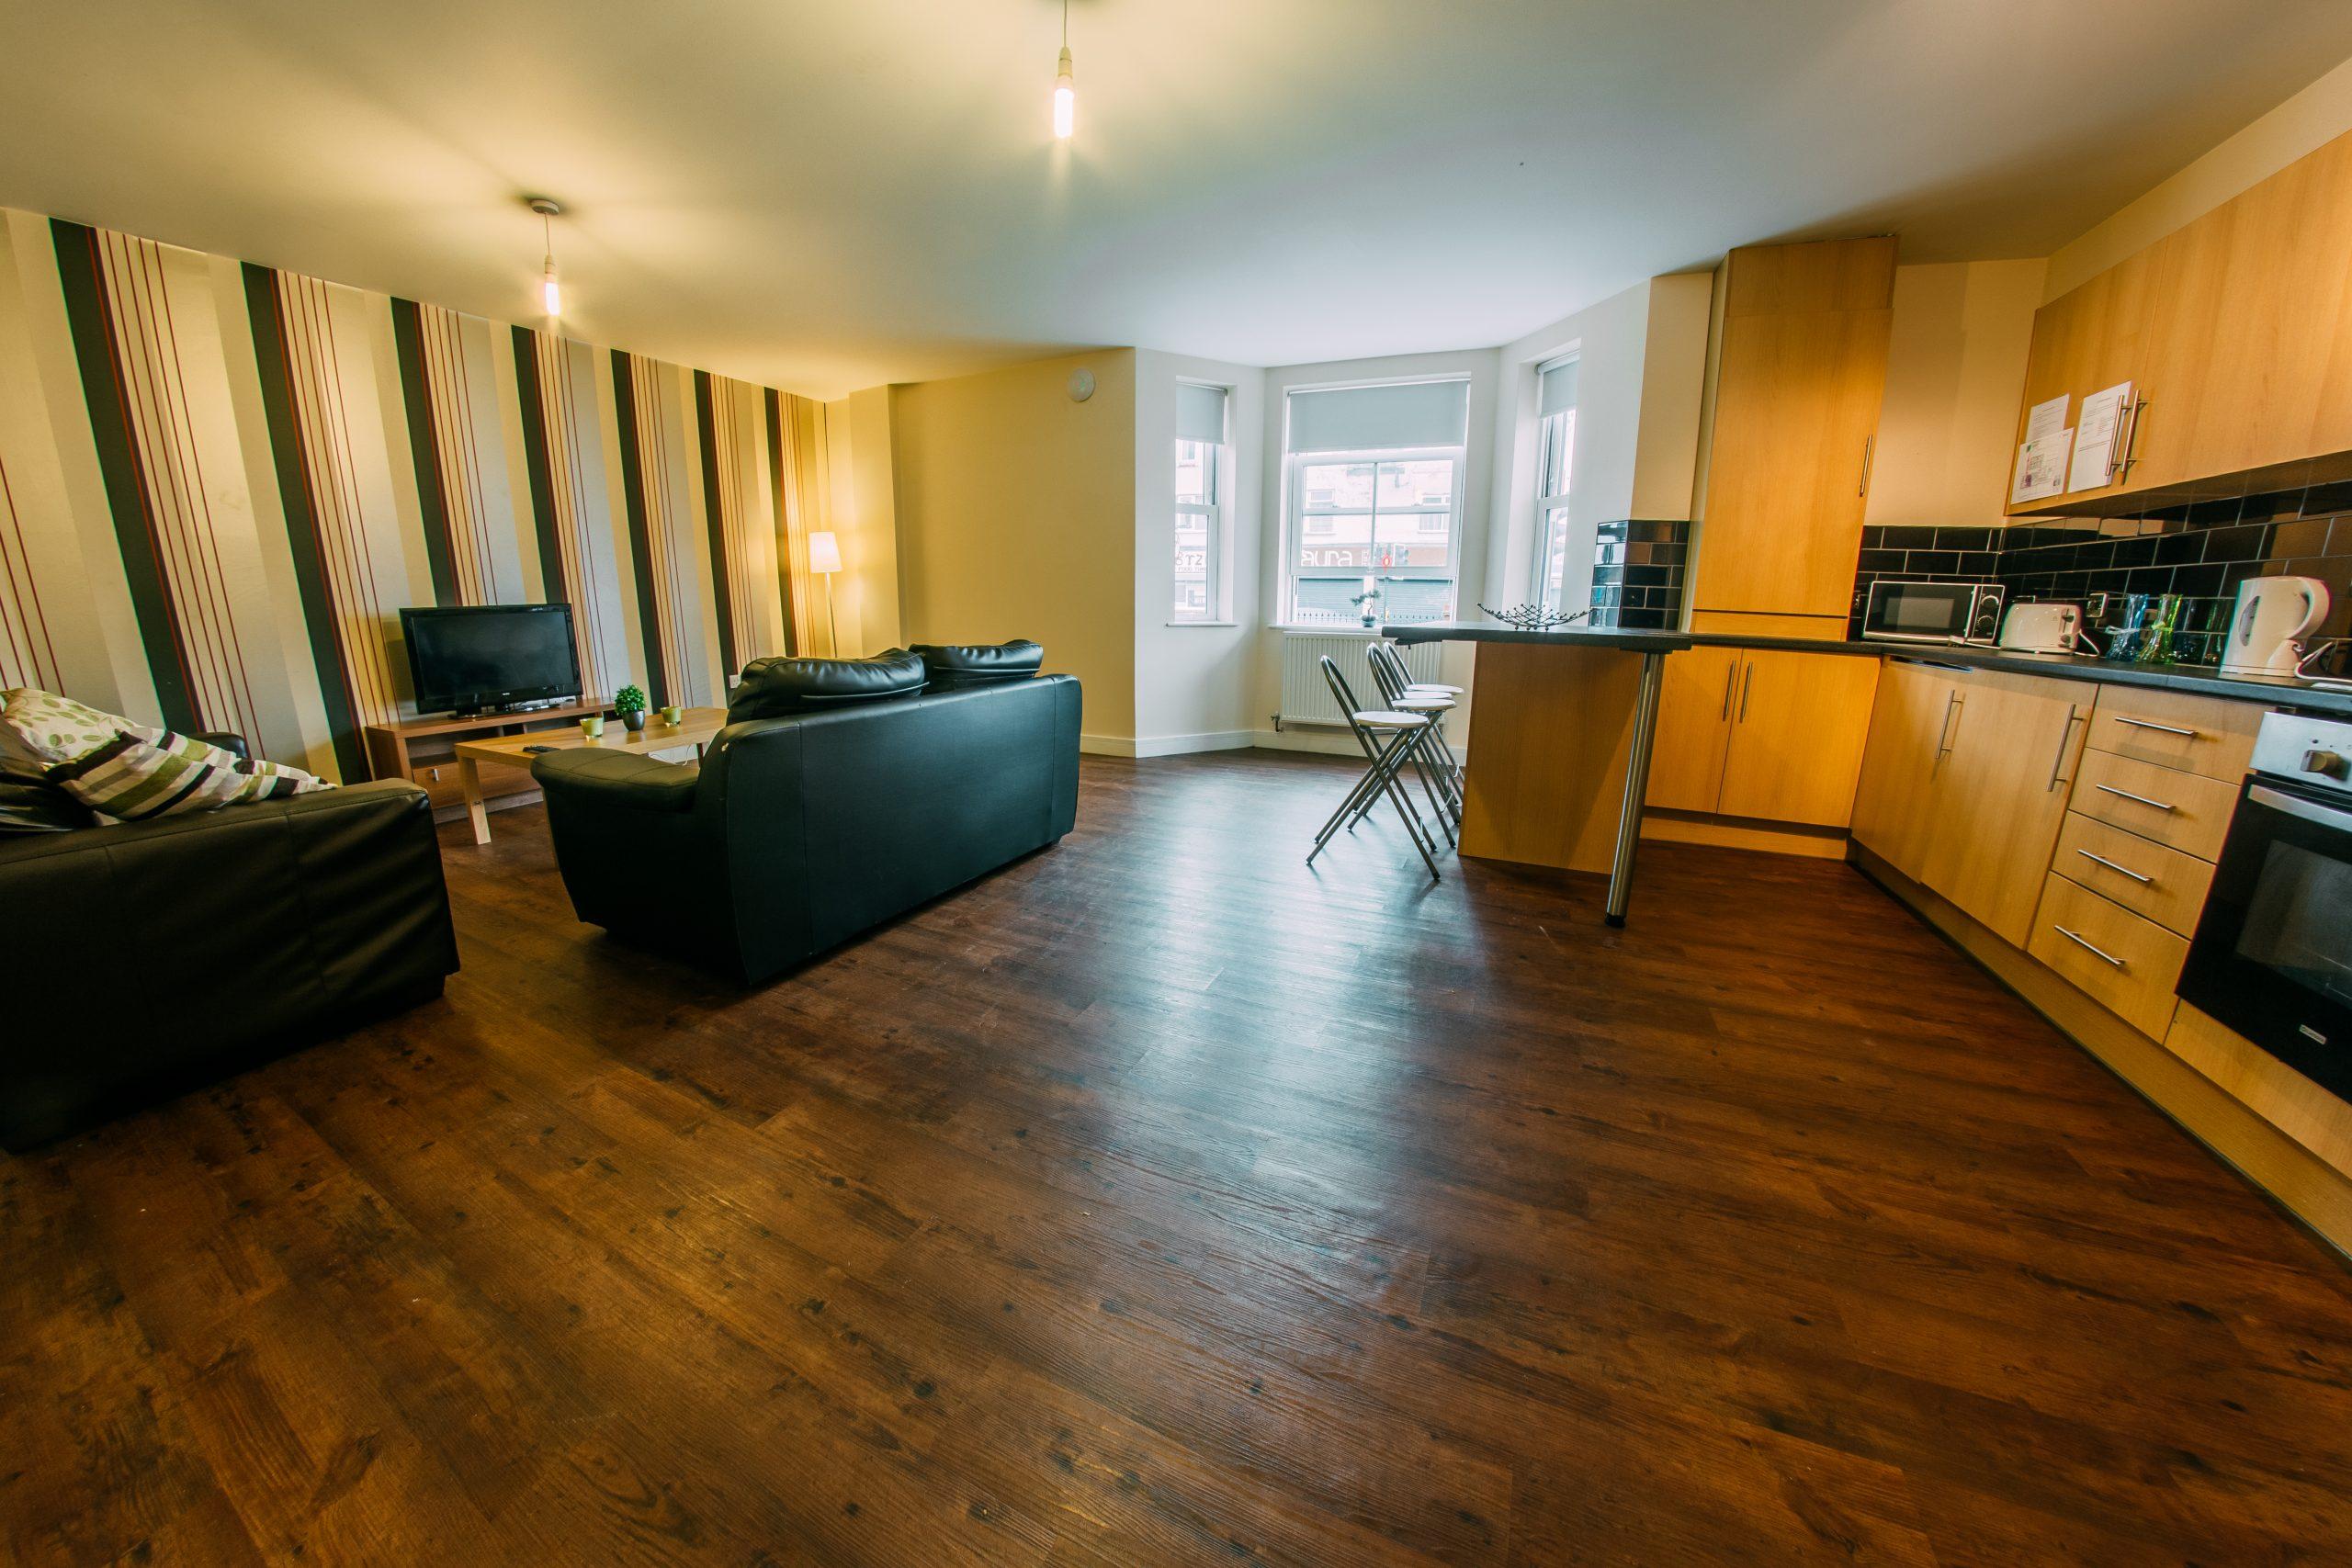 student accommodation rental hull, en suite student accommodation hull, all inclusive student accommodation hull